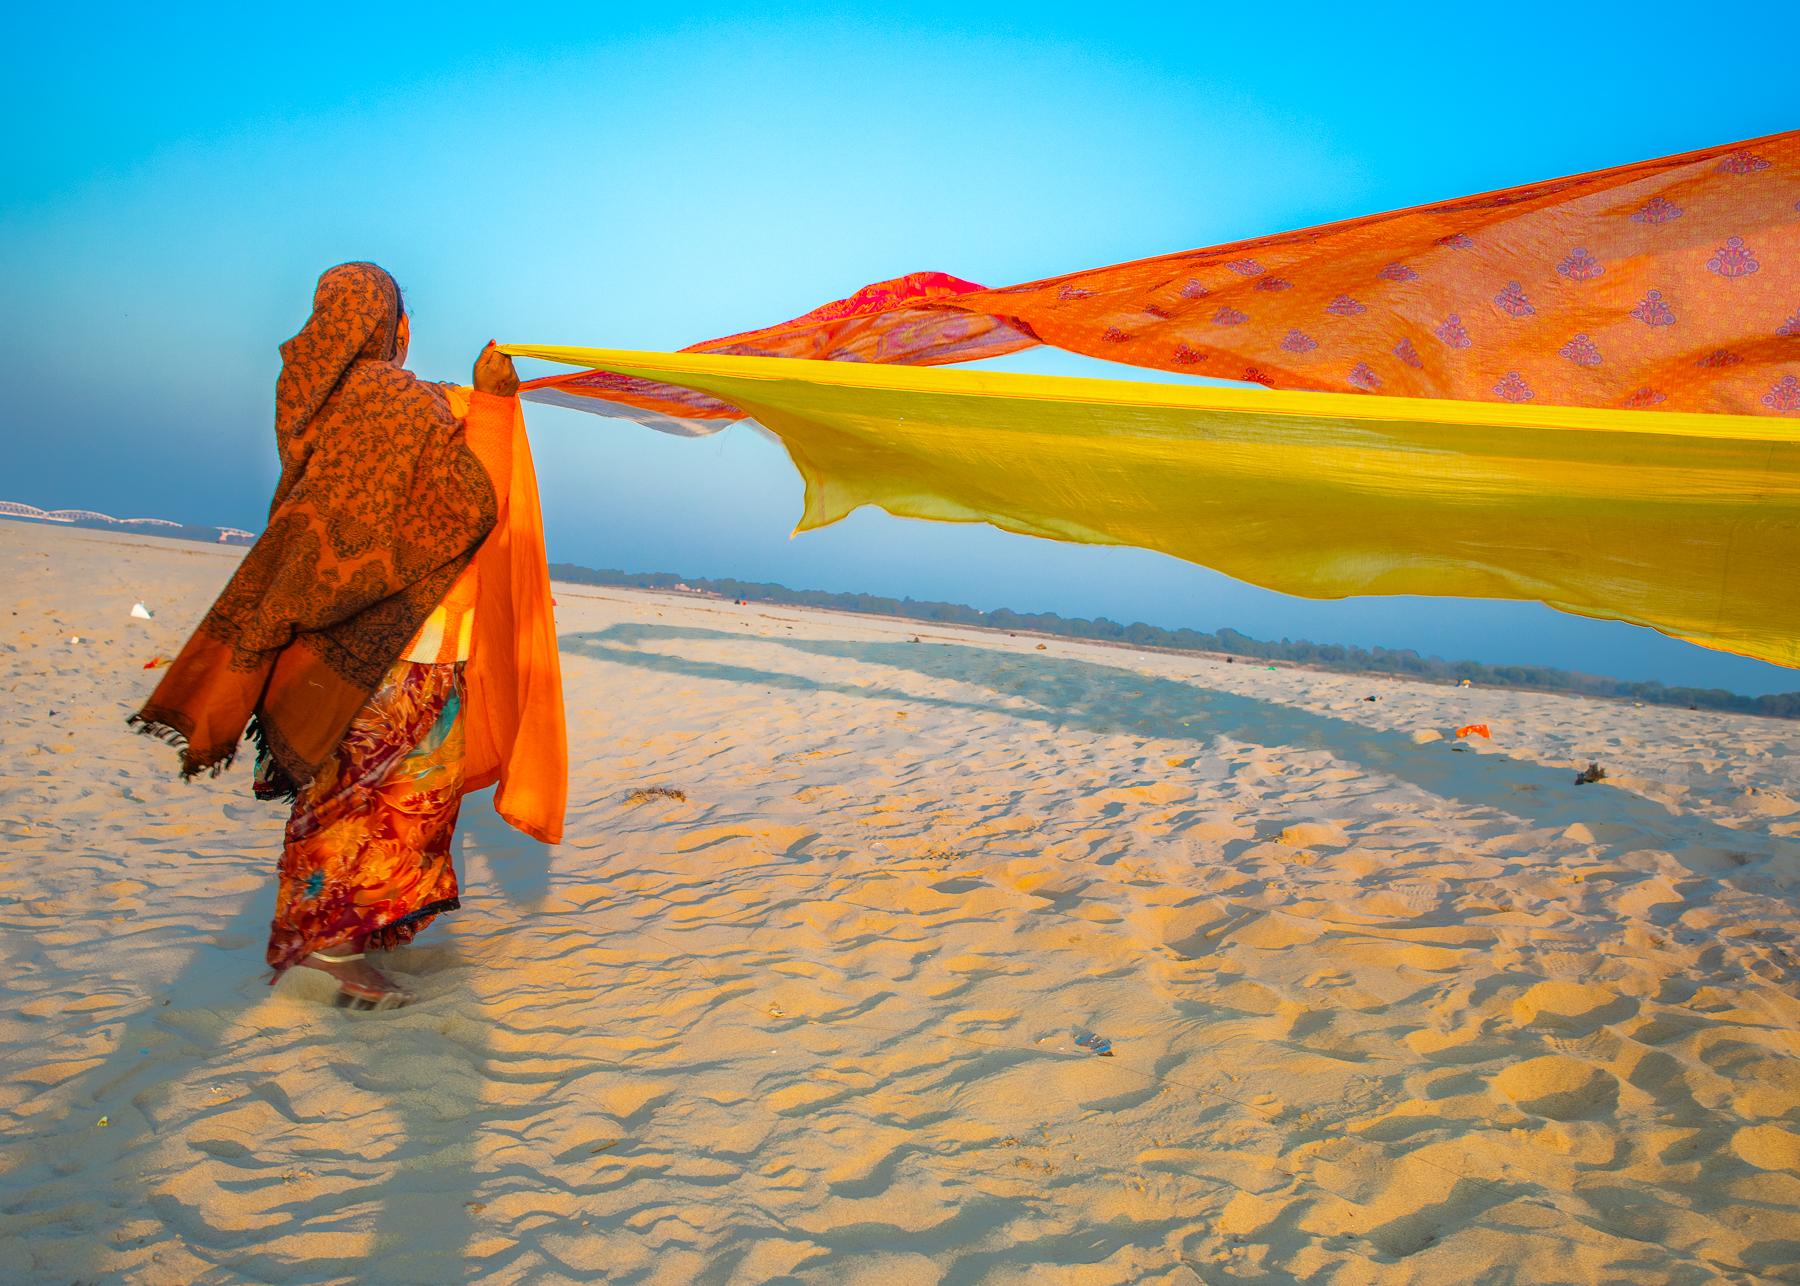 Diana_Berrent_Drying Saris on the Banks of the Ganges.jpg.jpg